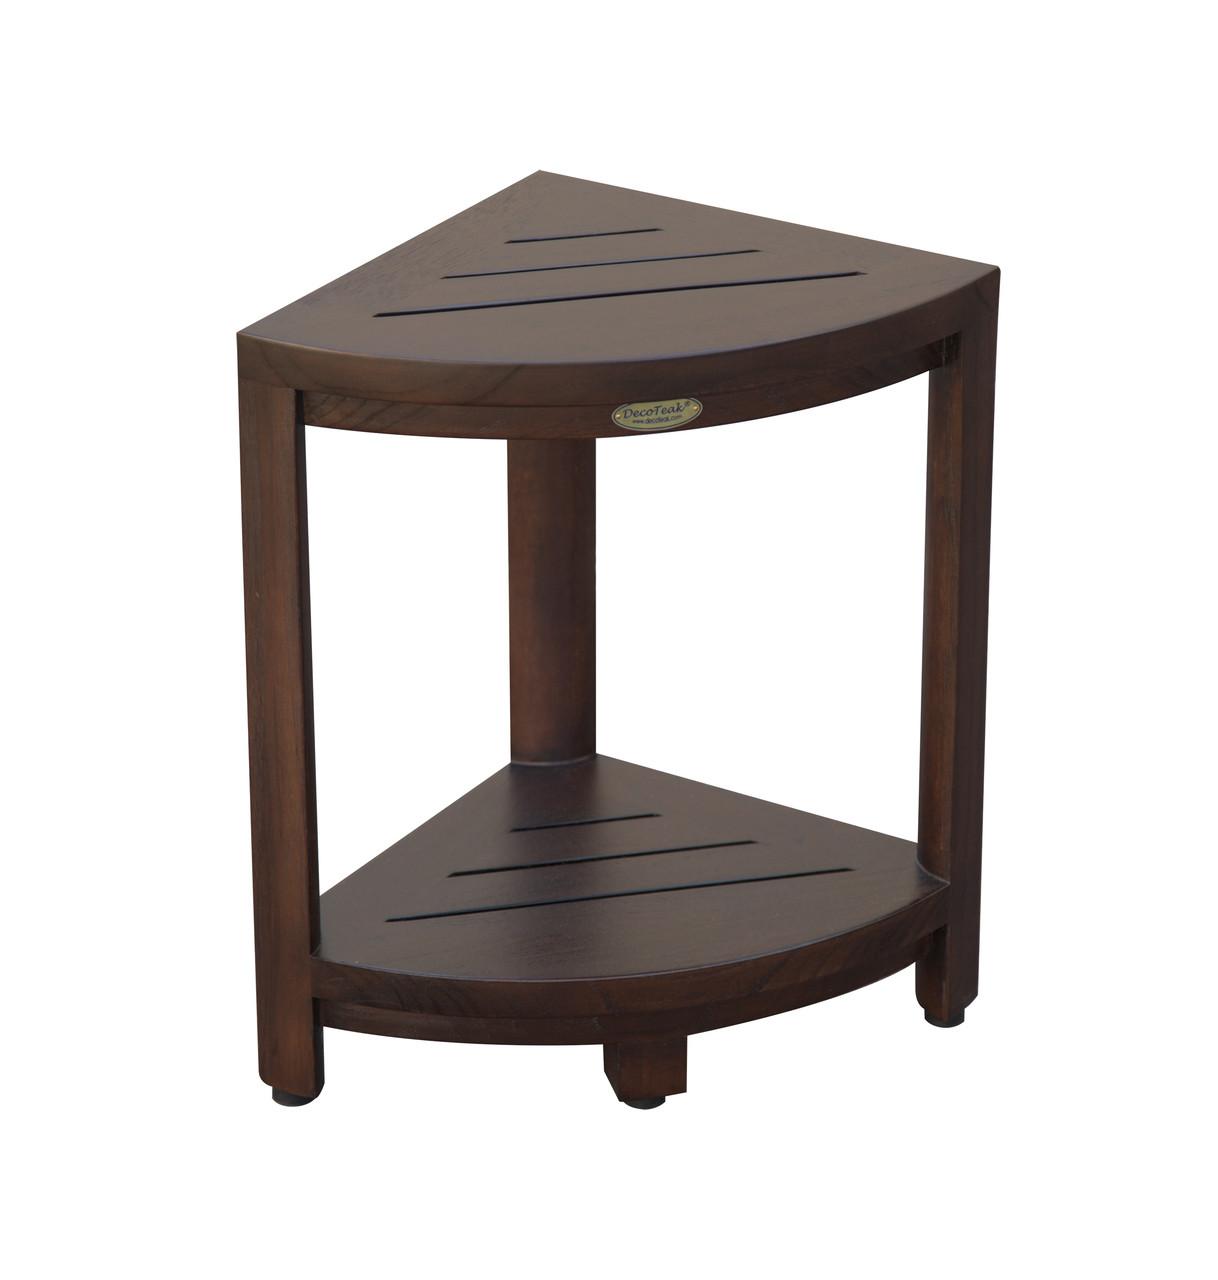 "DecoTeak SnazzyCorner 18"" Teak Wood Fully Assembled Corner Shower Bench with Shelf in Woodland Brown Finish"